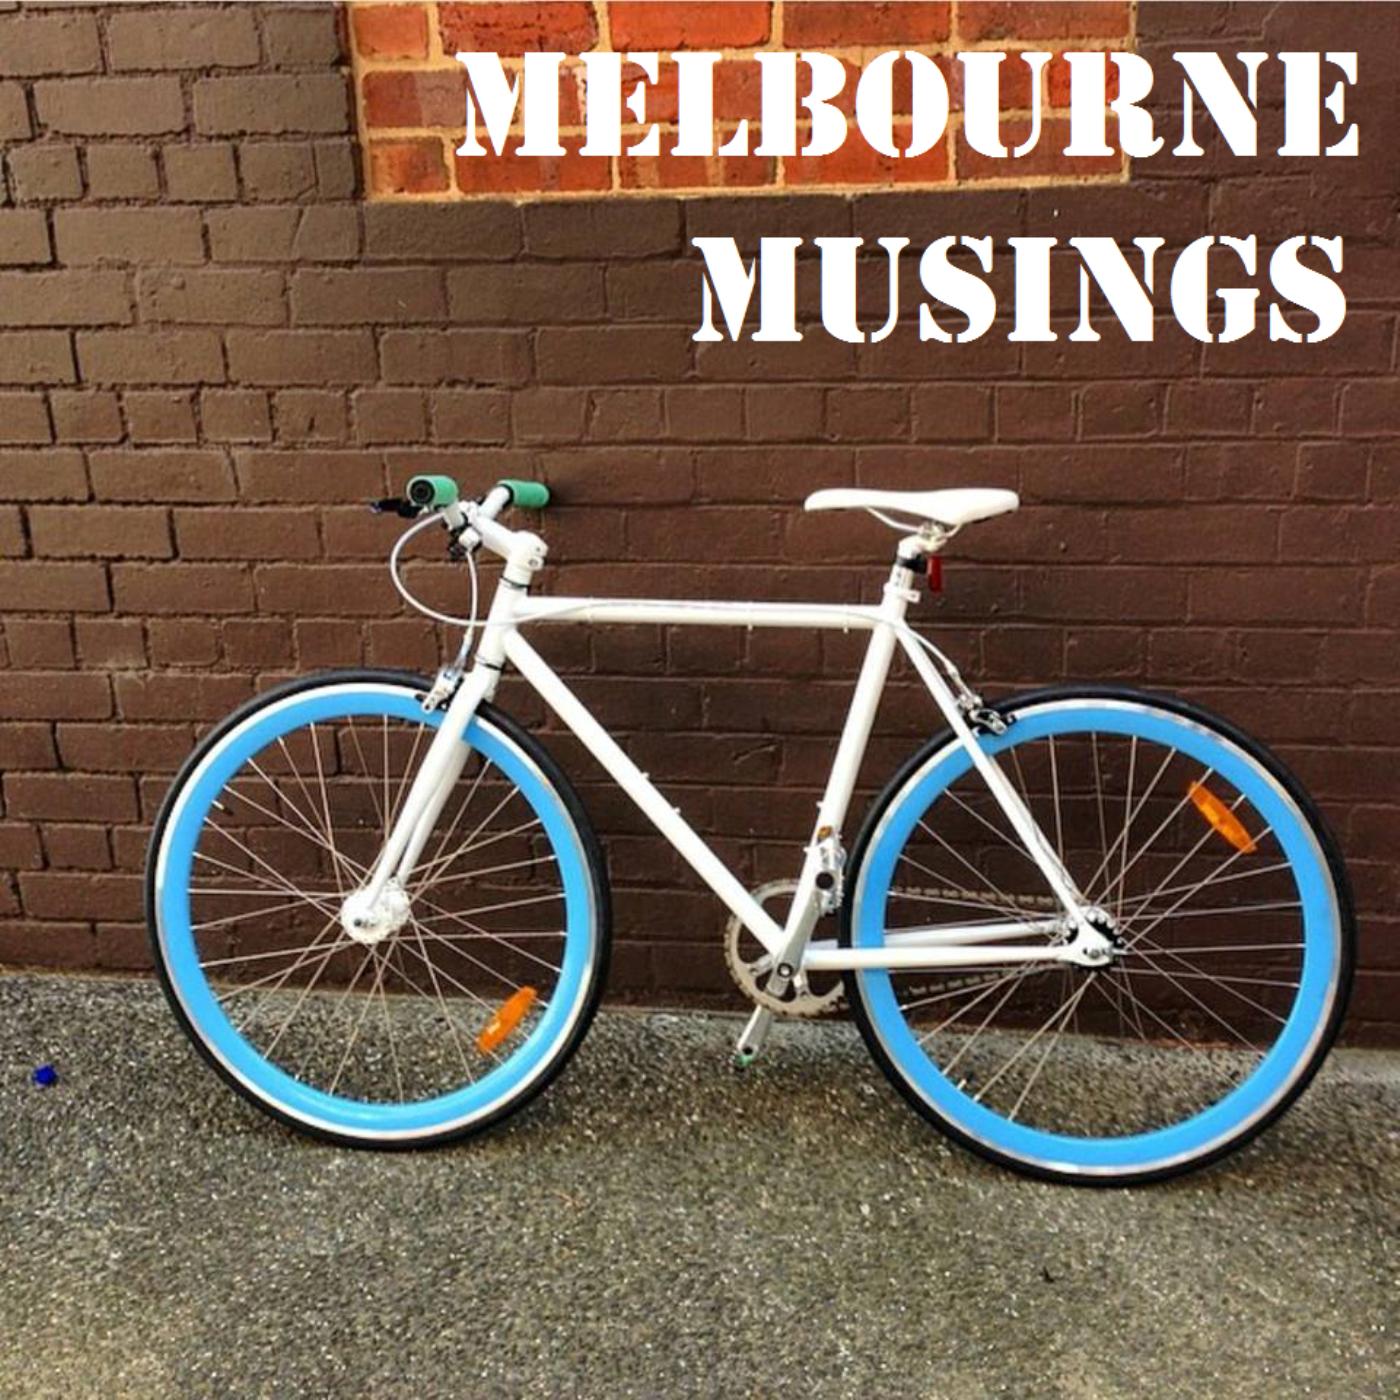 Melbourne Musings Podcast show art